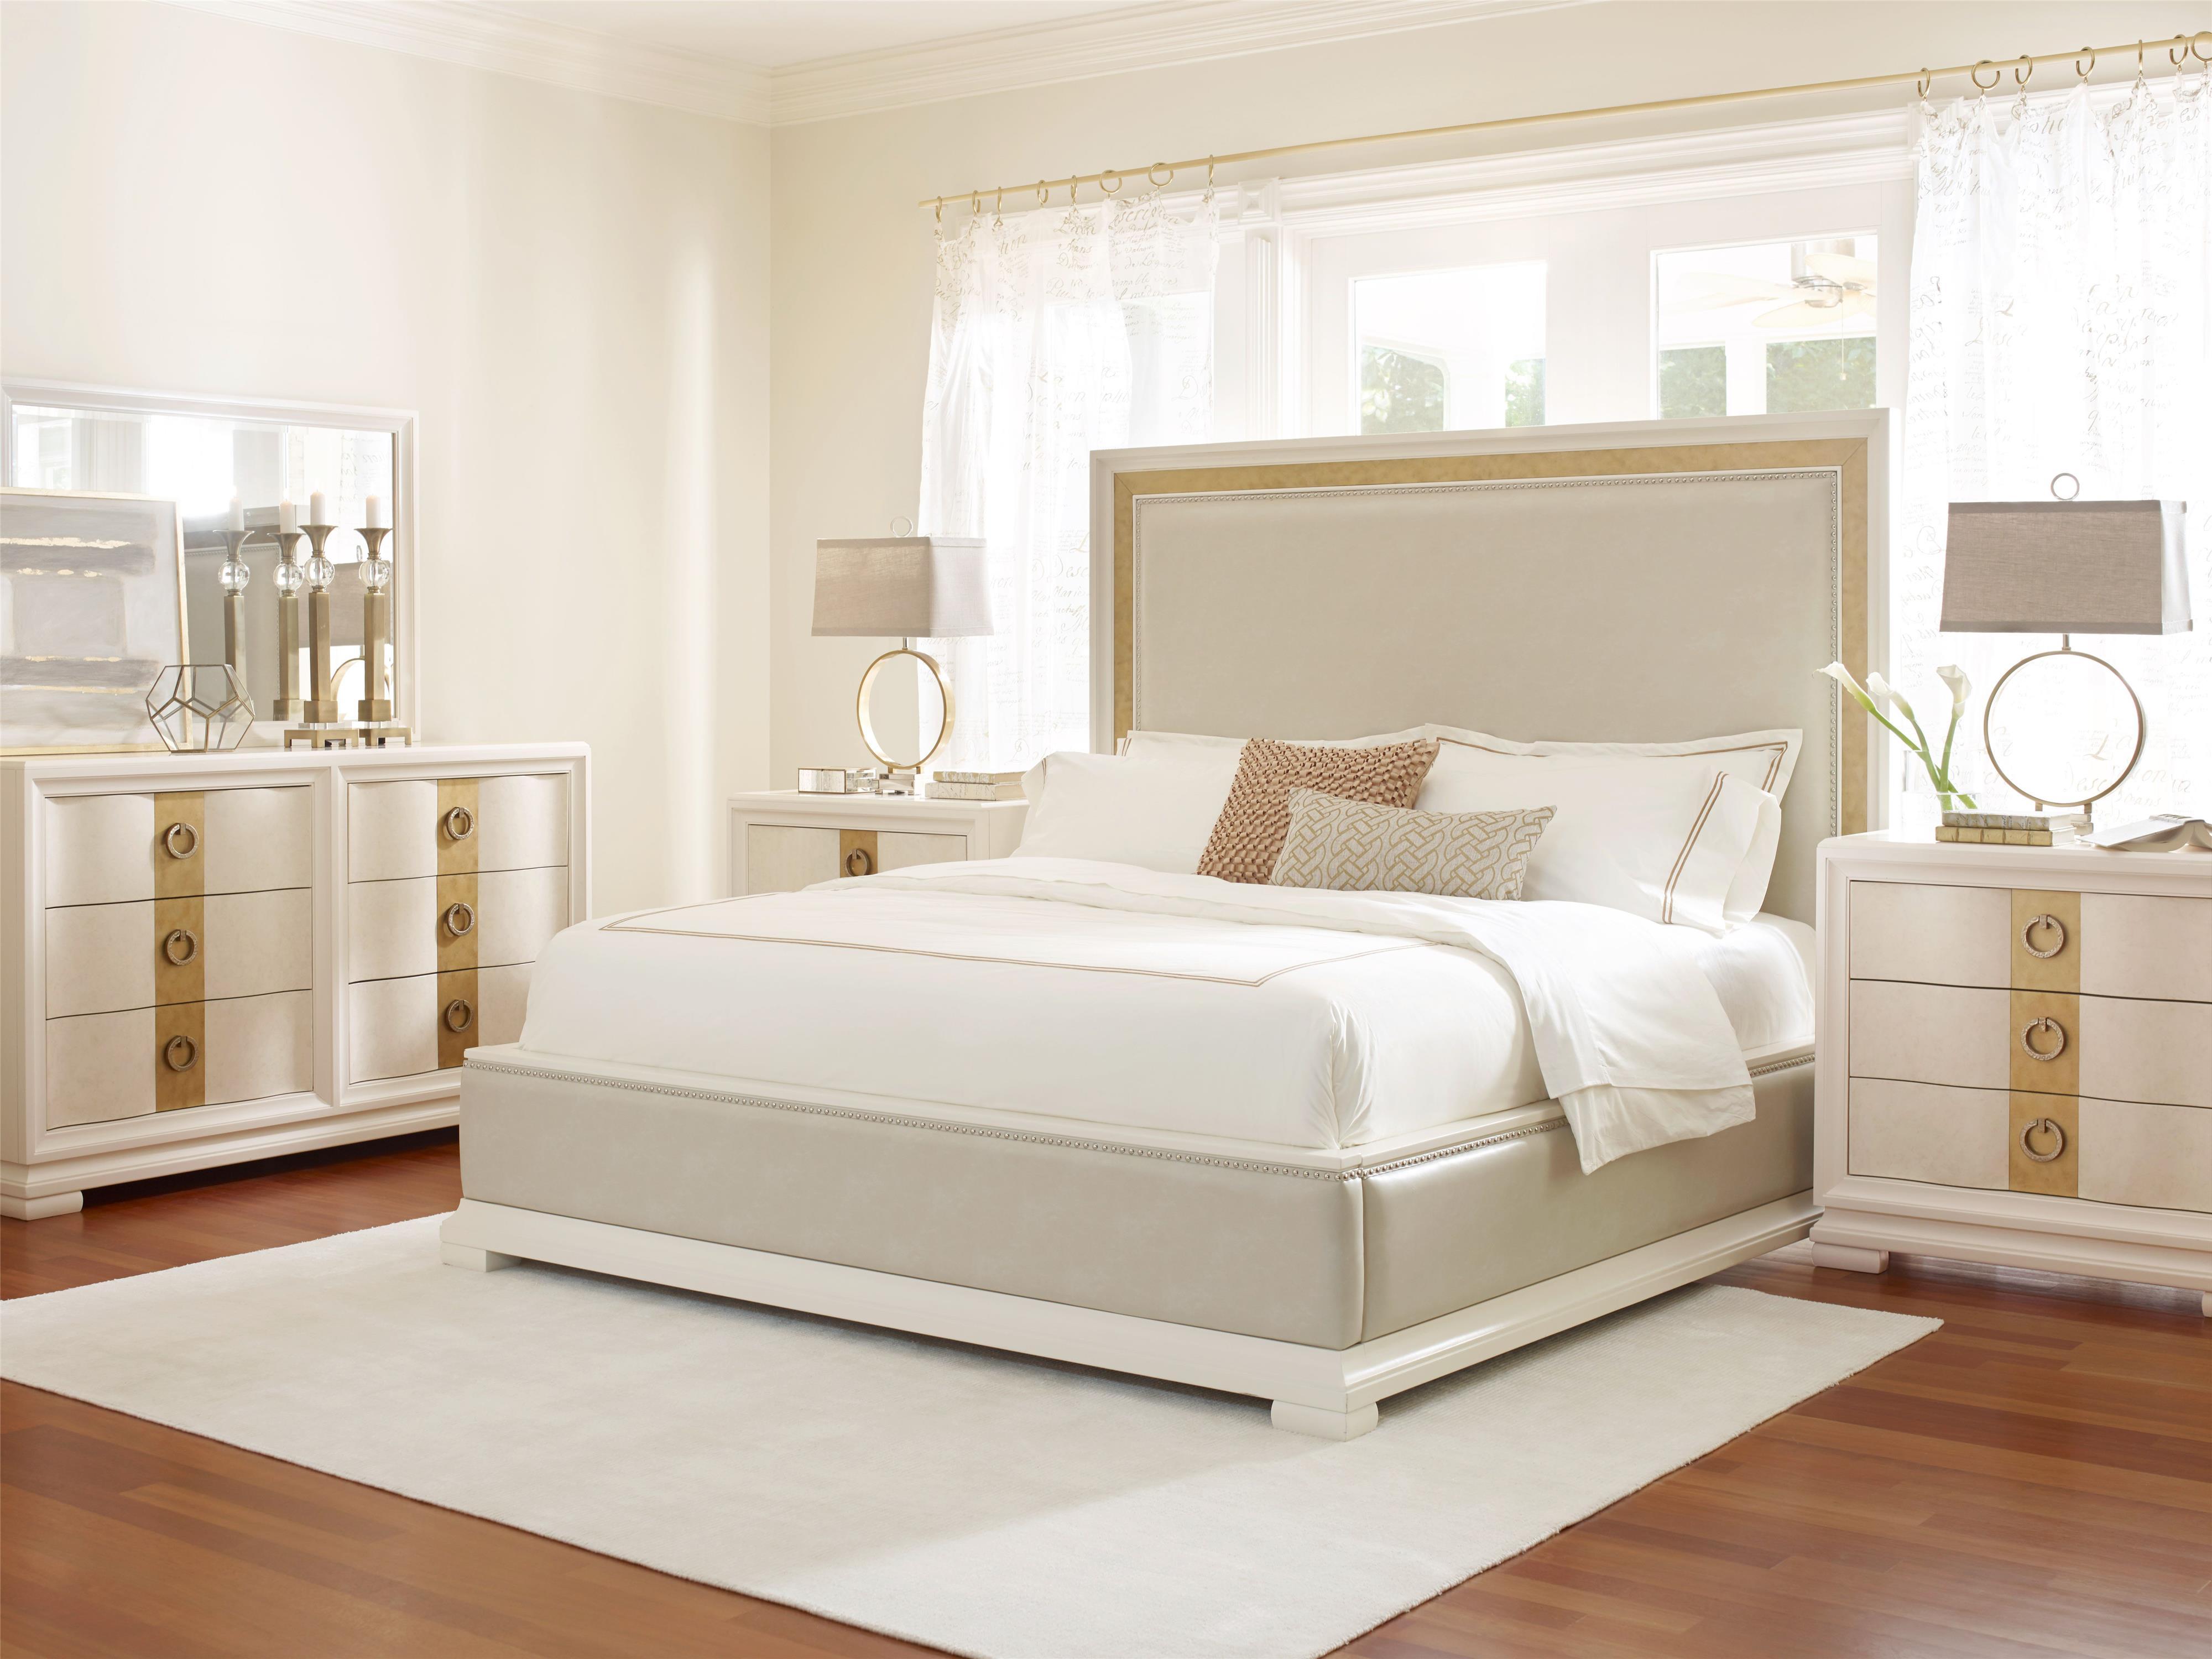 Legacy Classic Tower Suite King Bedroom Group - Item Number: 5010 K Bedroom Group 3